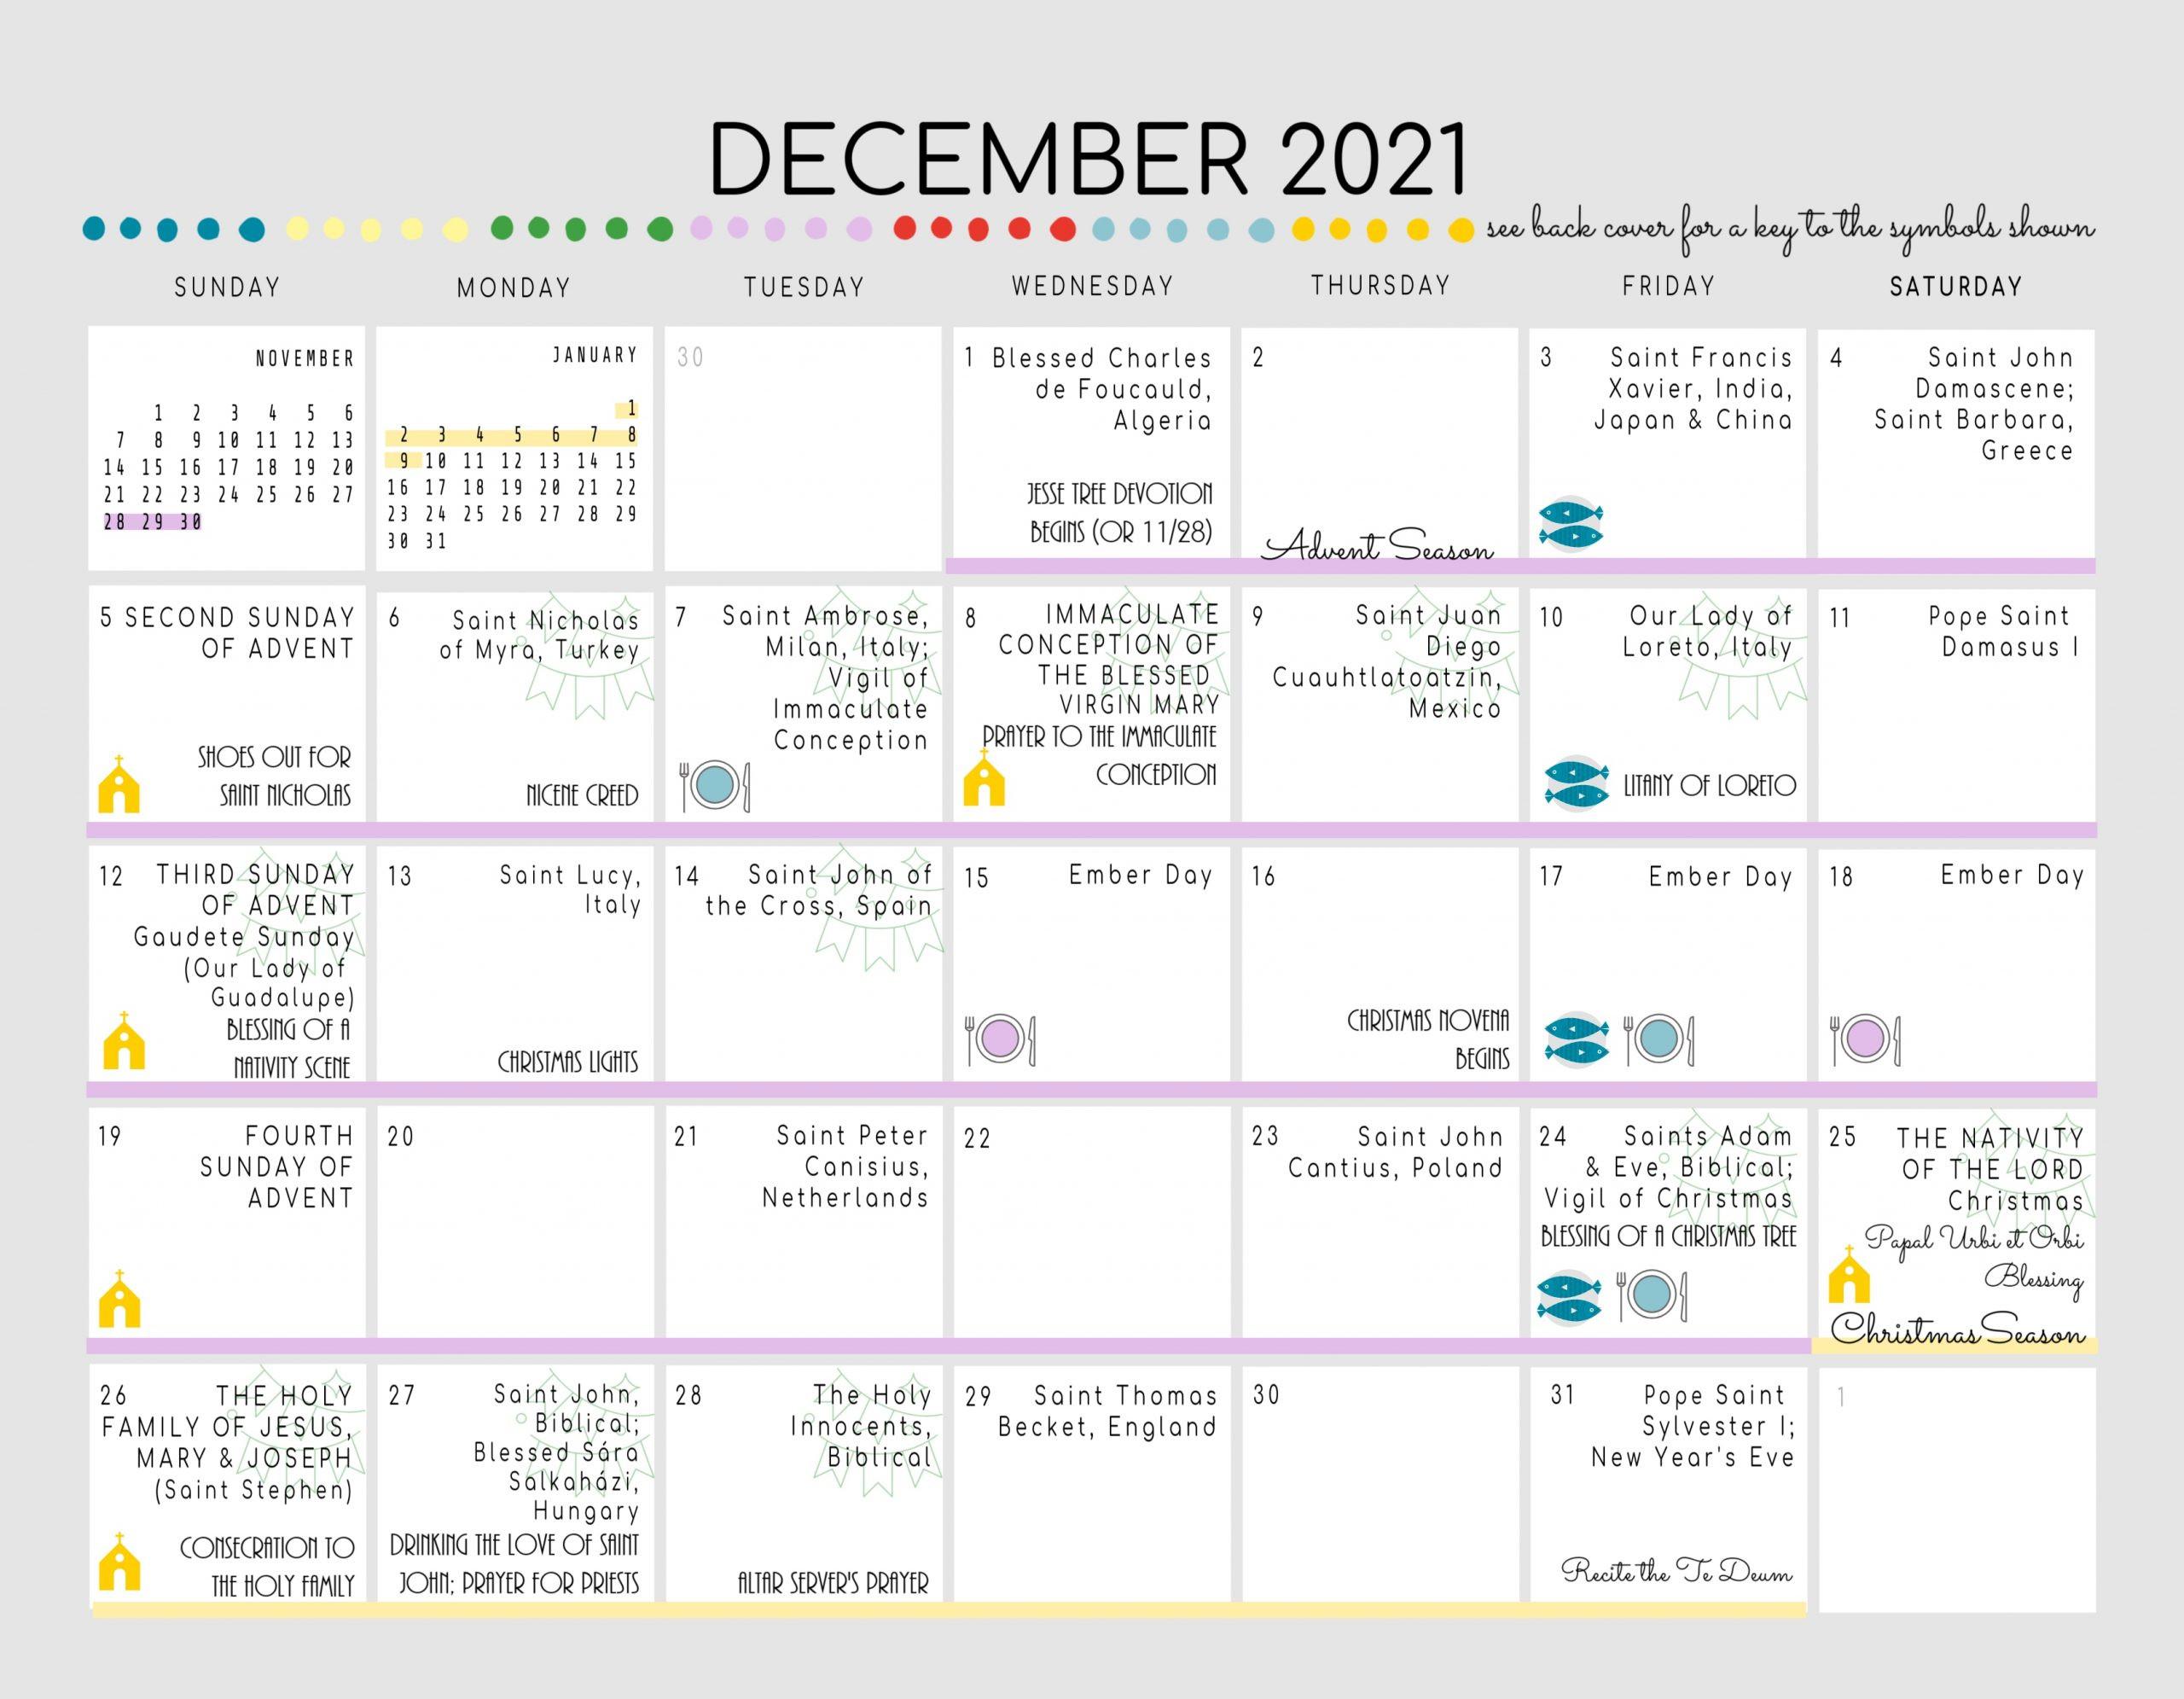 Catholic All Year 2021 Liturgical Calendar With Nrsvce  Liturgical Calendar Dates For 2021